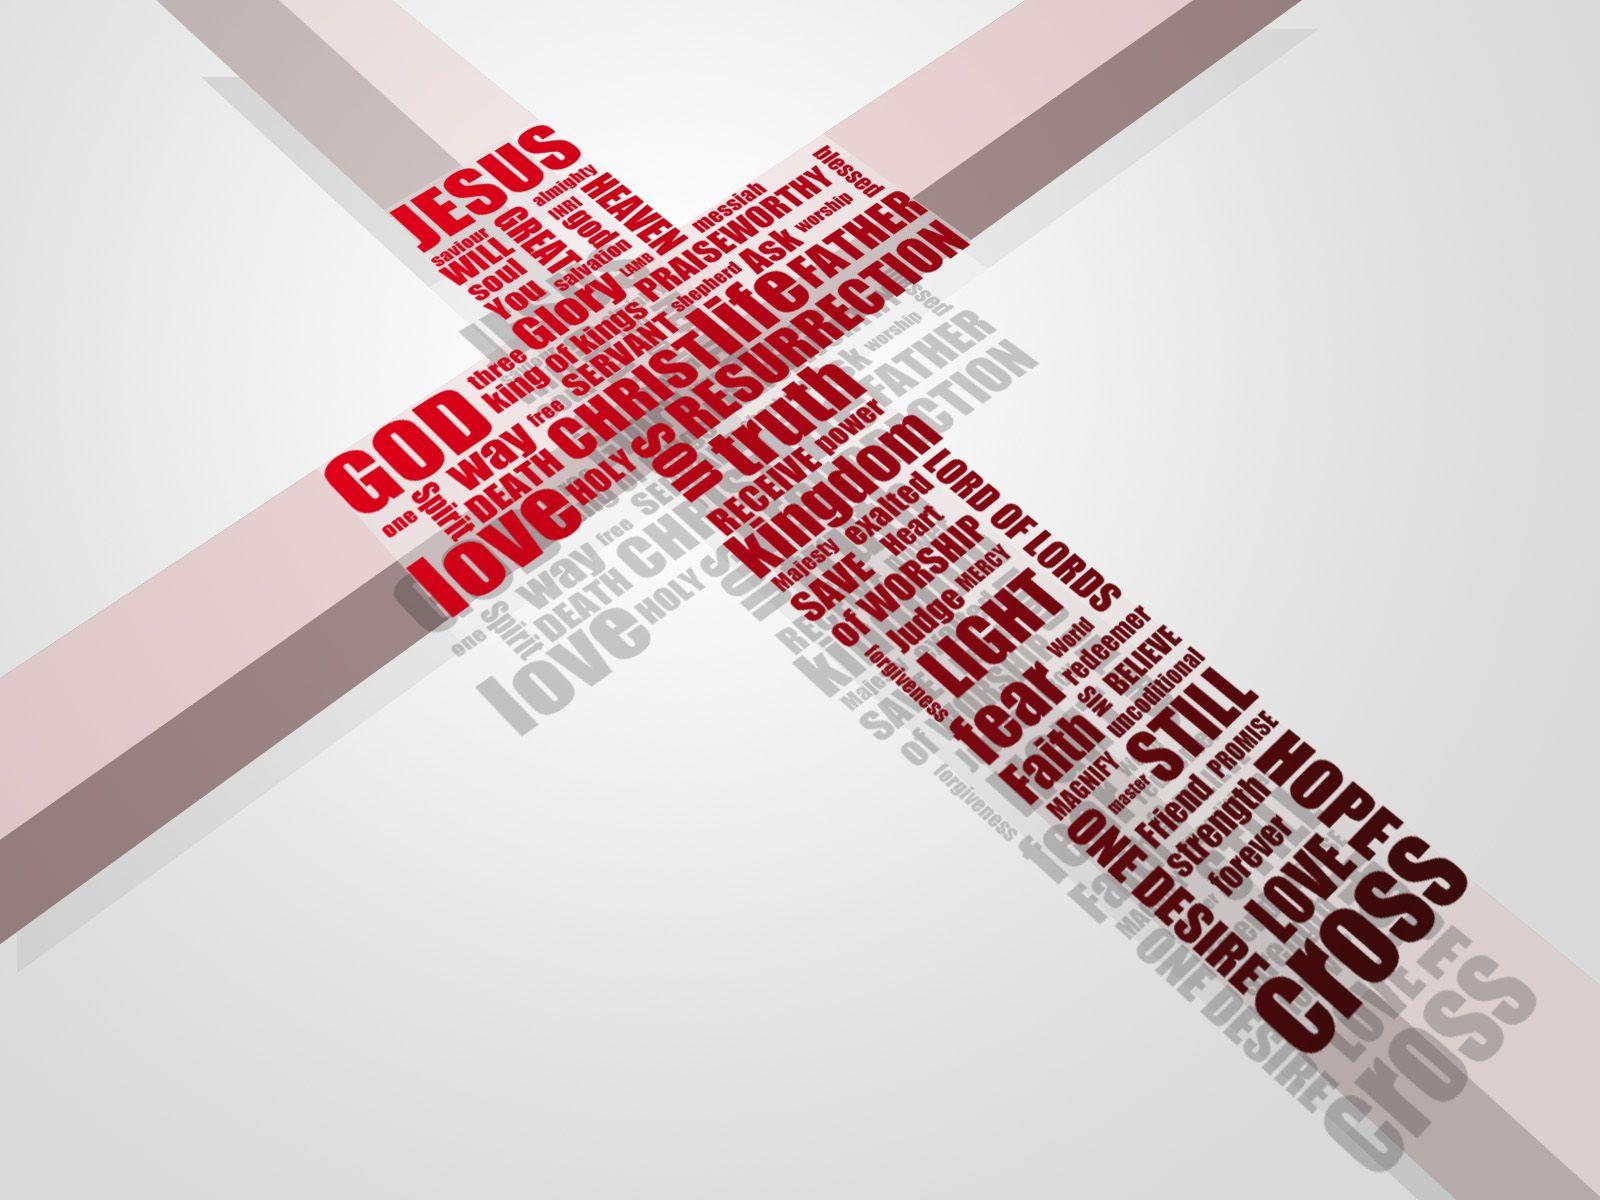 Cross and Names Papel de Parede ImagemJesus Cross Wallpaper